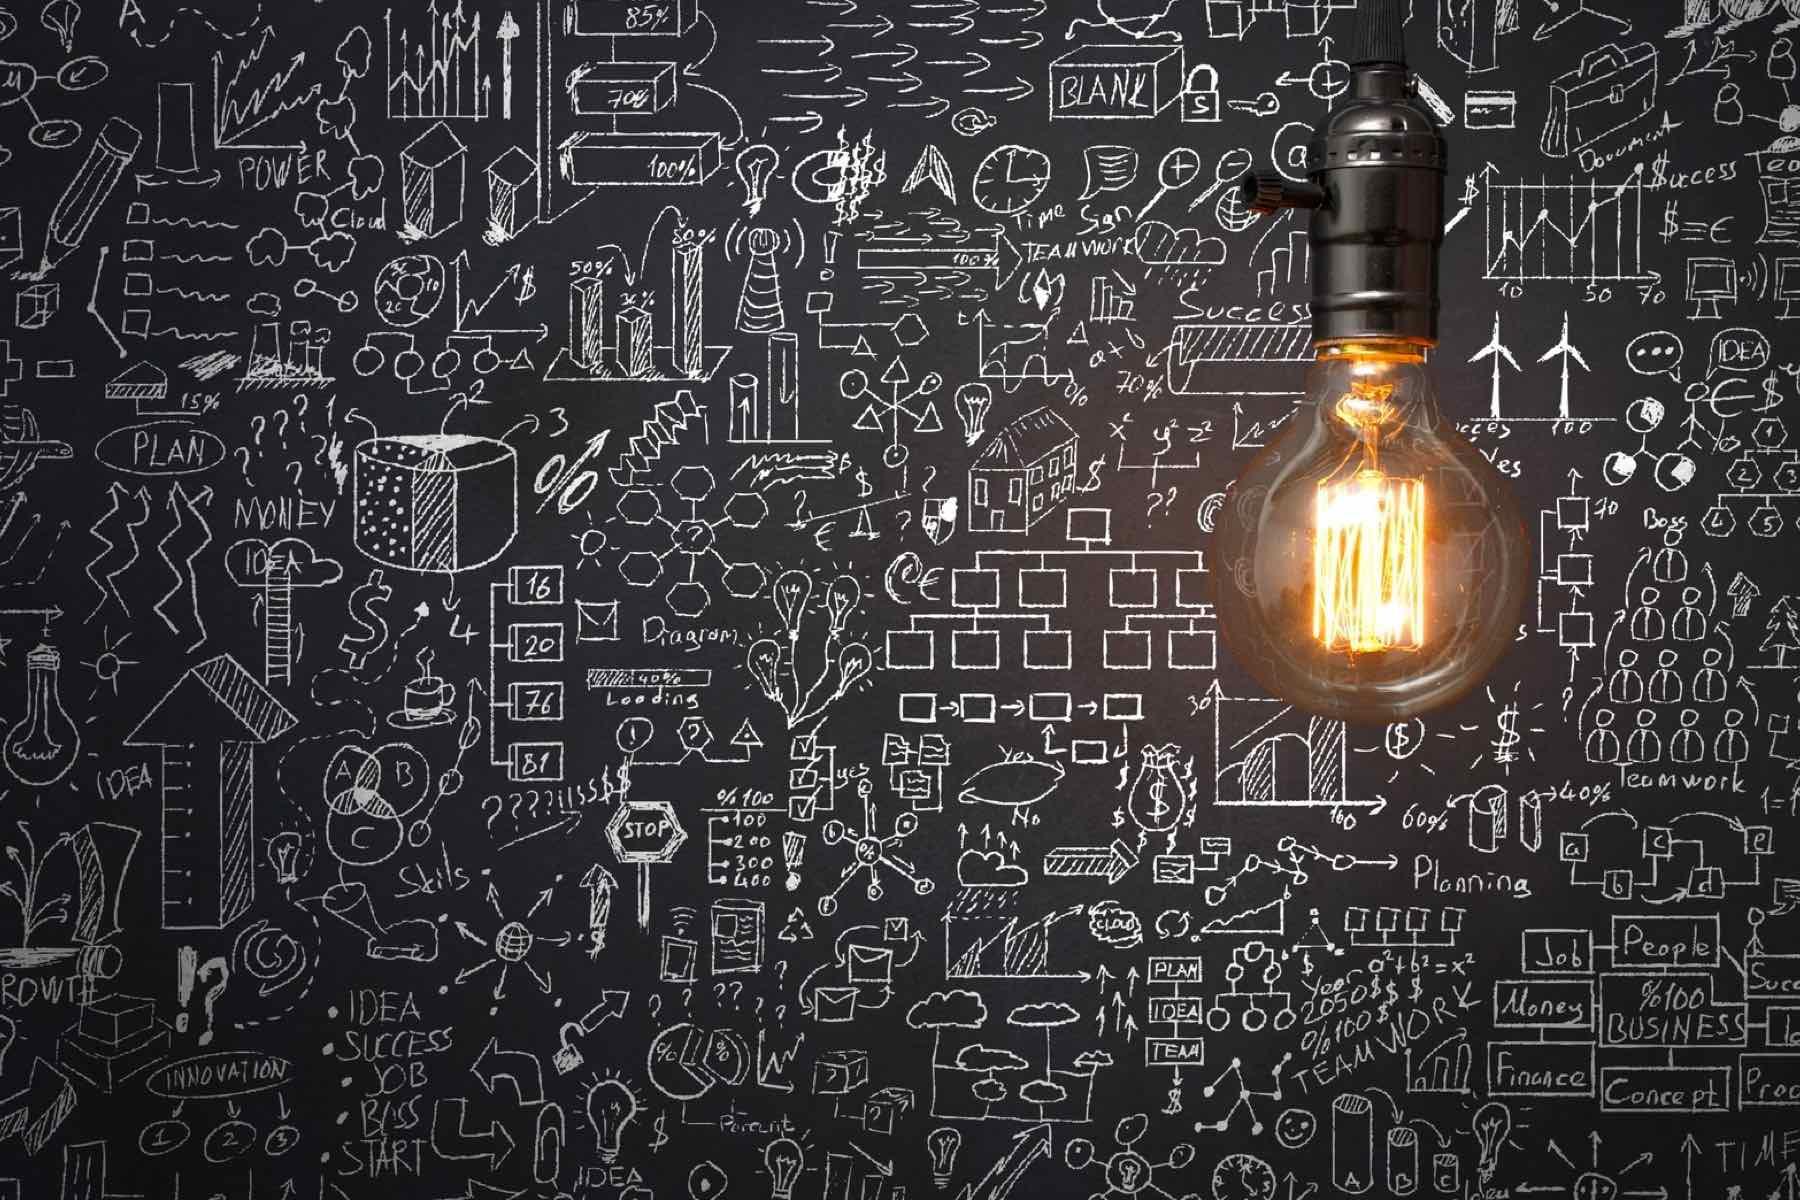 Chalk board with ideas